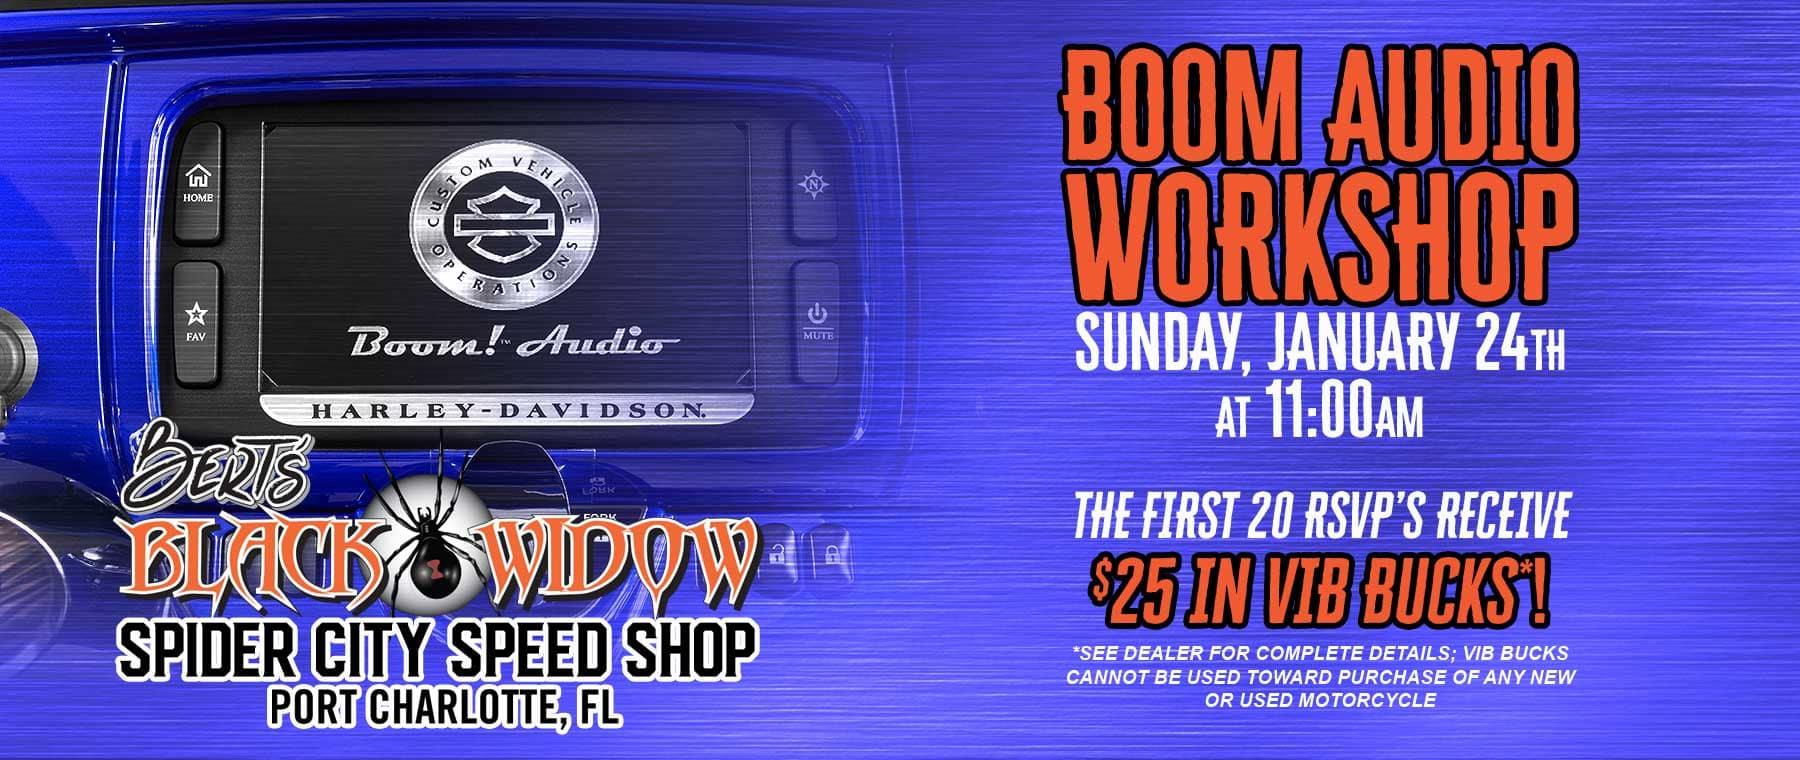 BERTS-HD_011821_BoomAudio-workshop-web